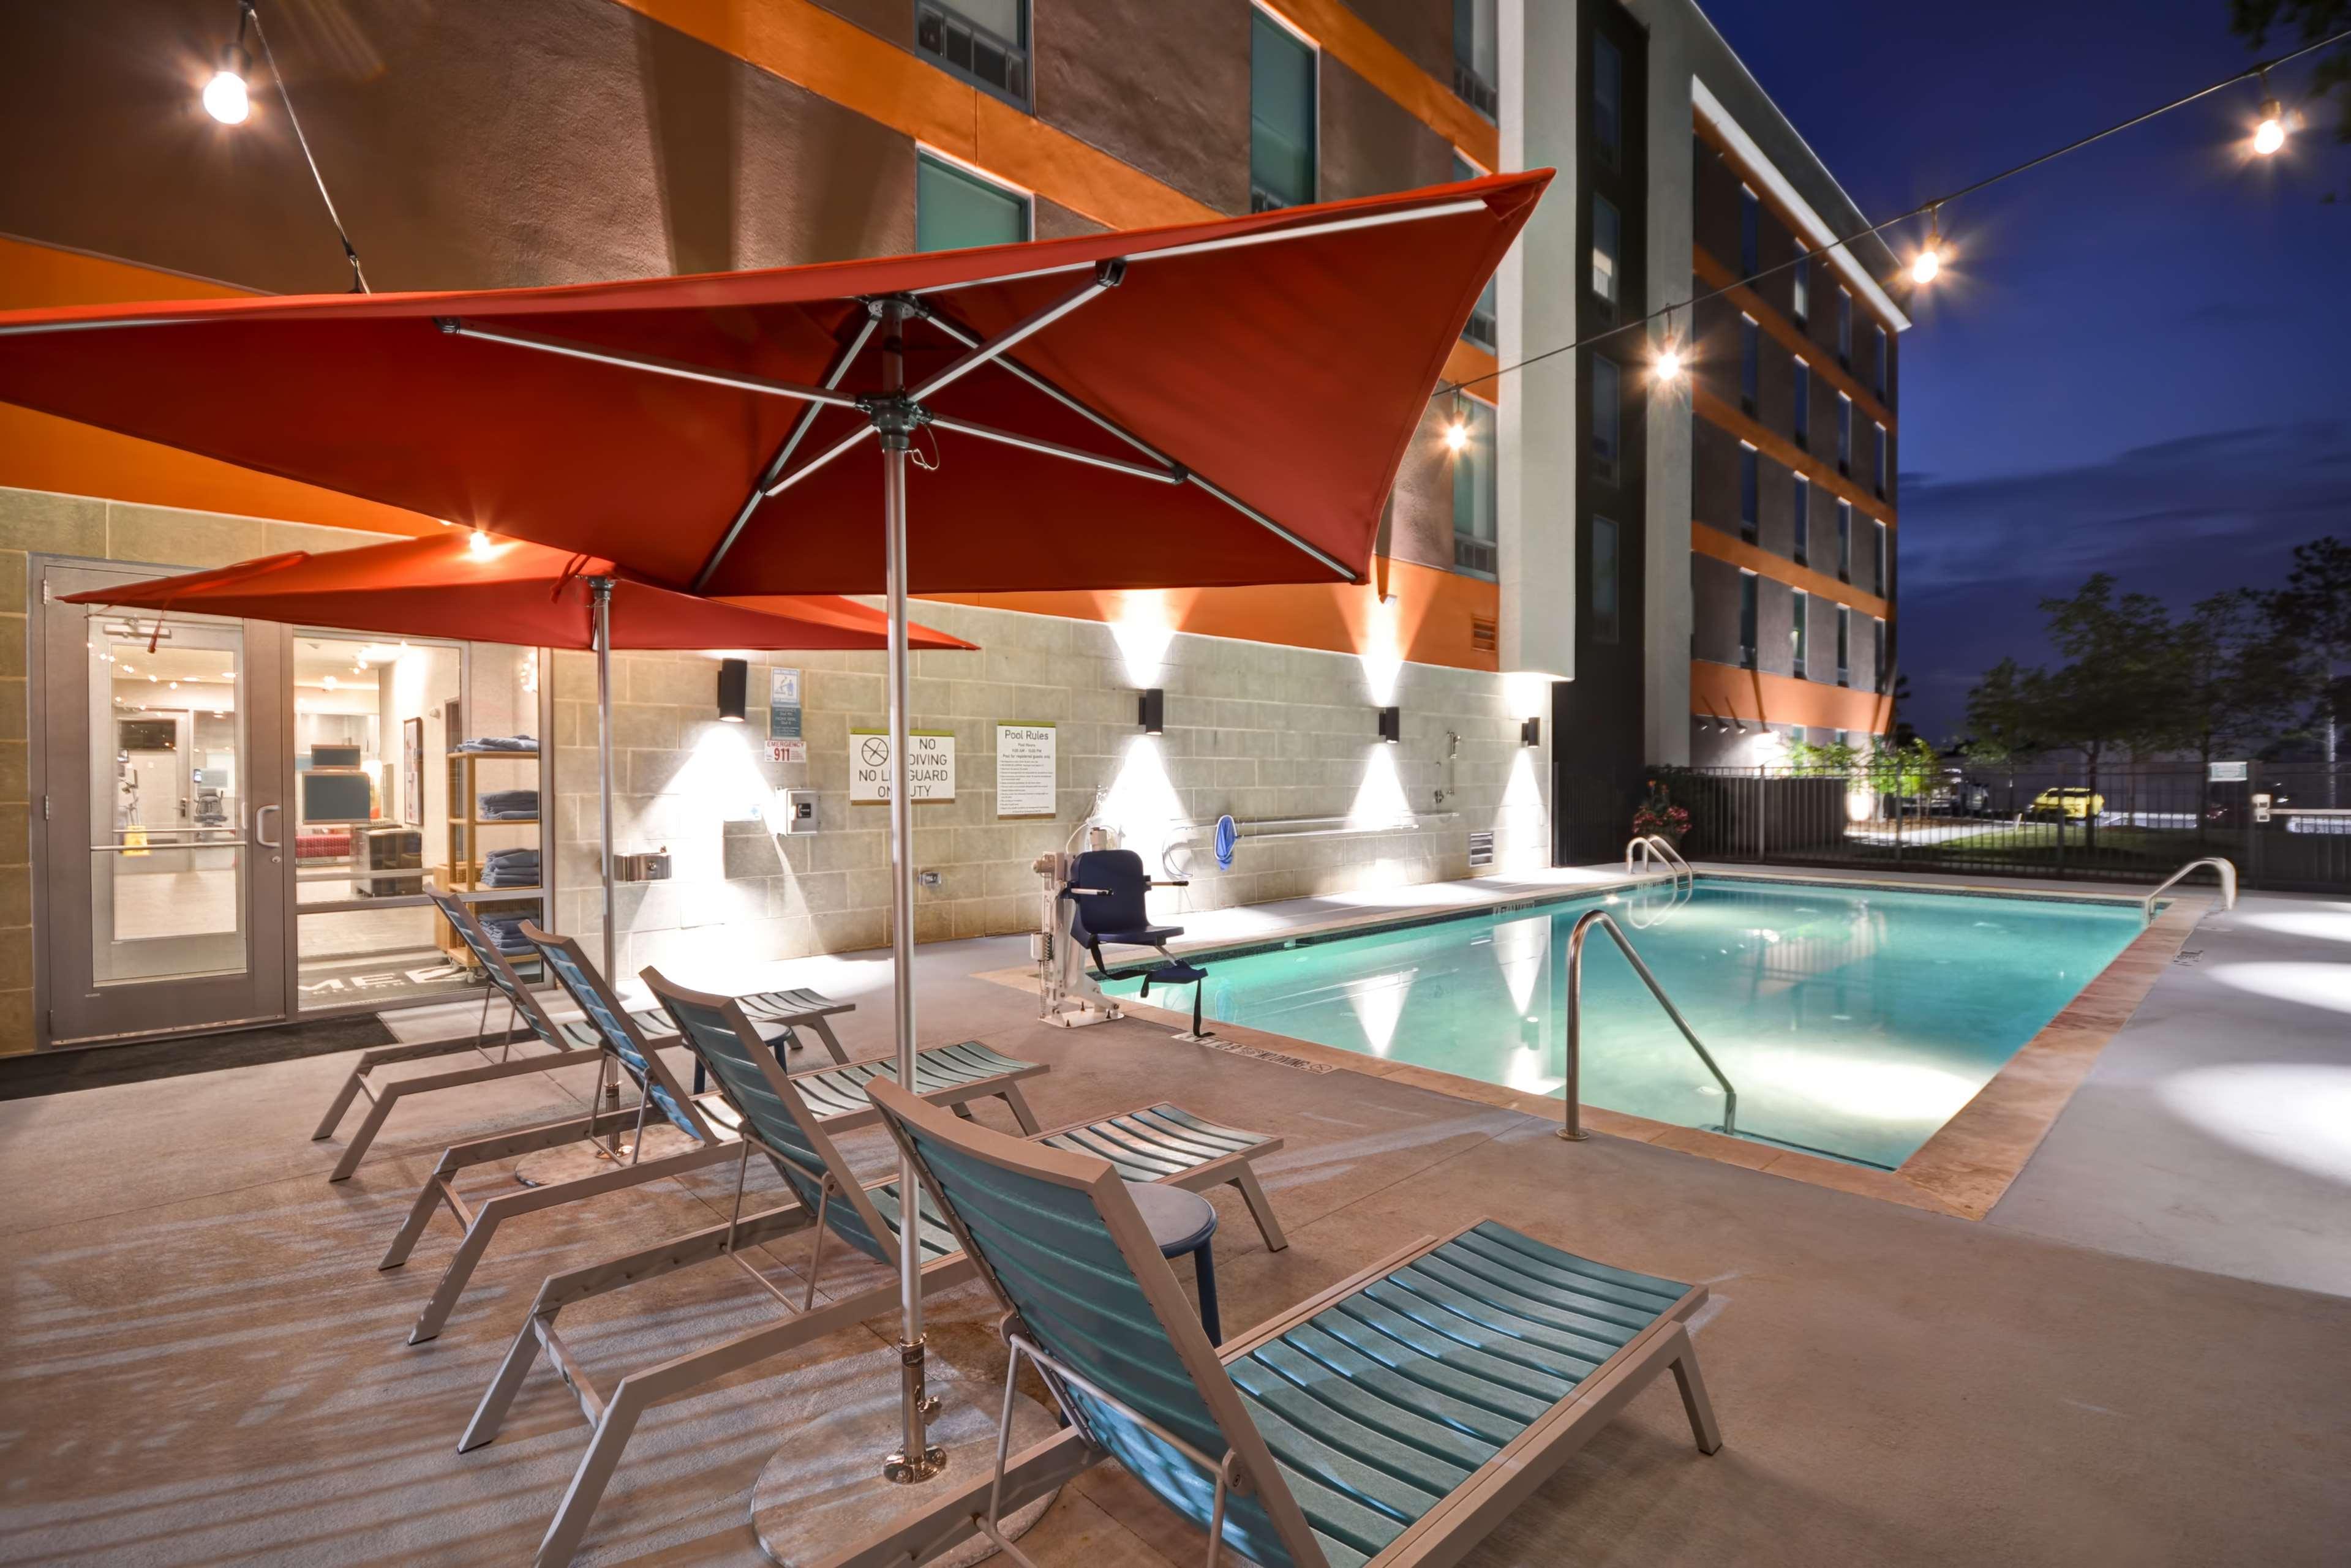 Home2 Suites by Hilton Atlanta West Lithia Springs image 14